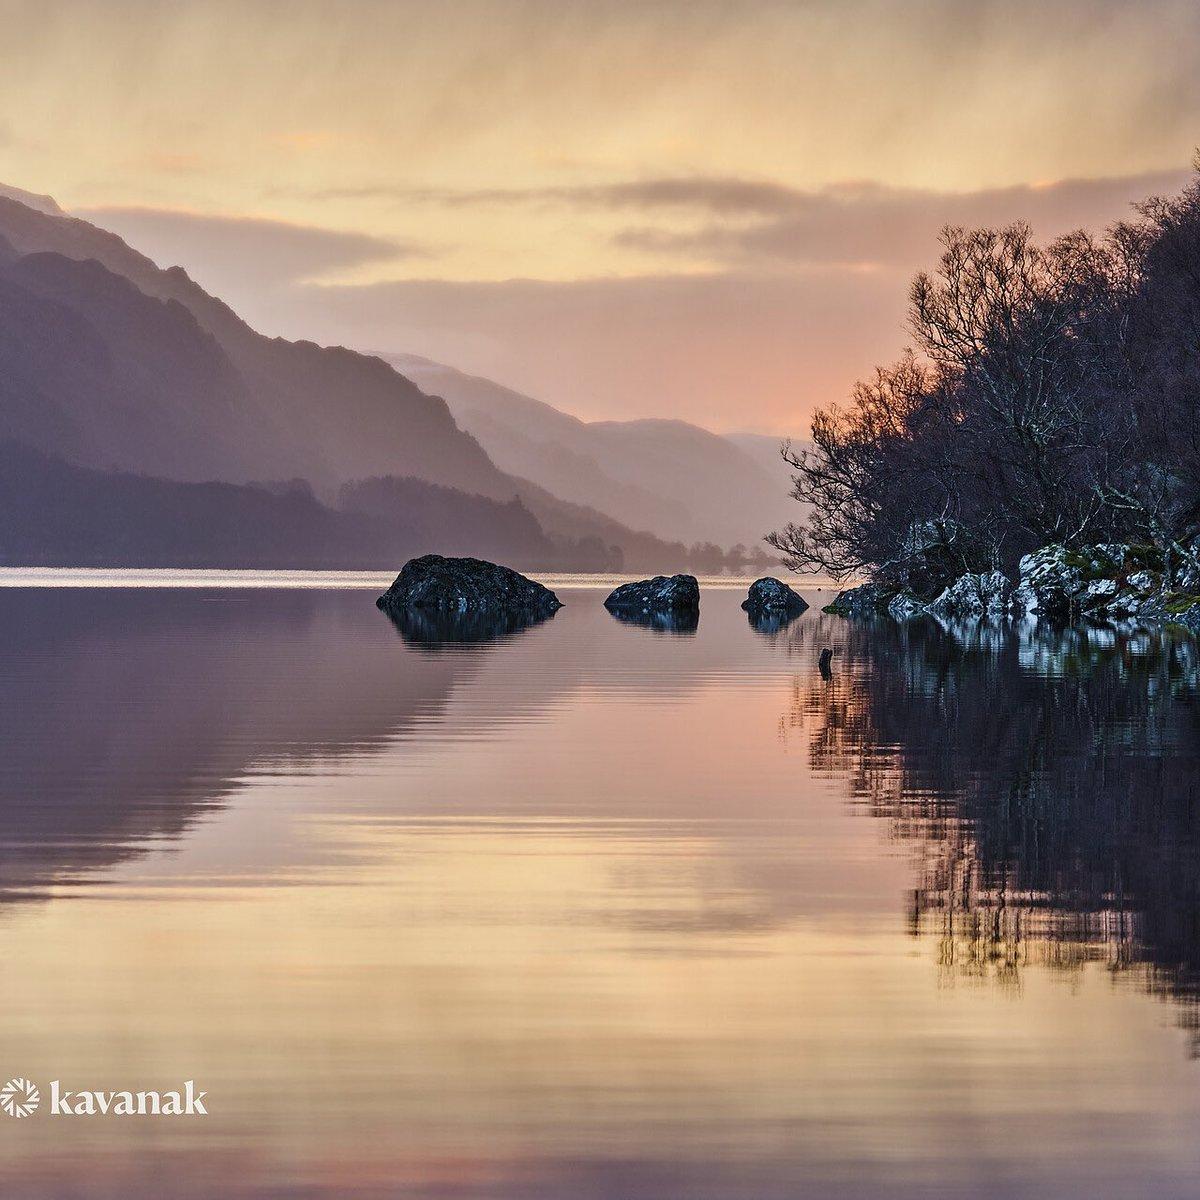 Replying to @ComKavanak:  Sunrise at Loch Maree in the stunning highlands of Scotland. #Sunrise #wcw #NaturePhotography #photooftheday #scotland #landscapephotography